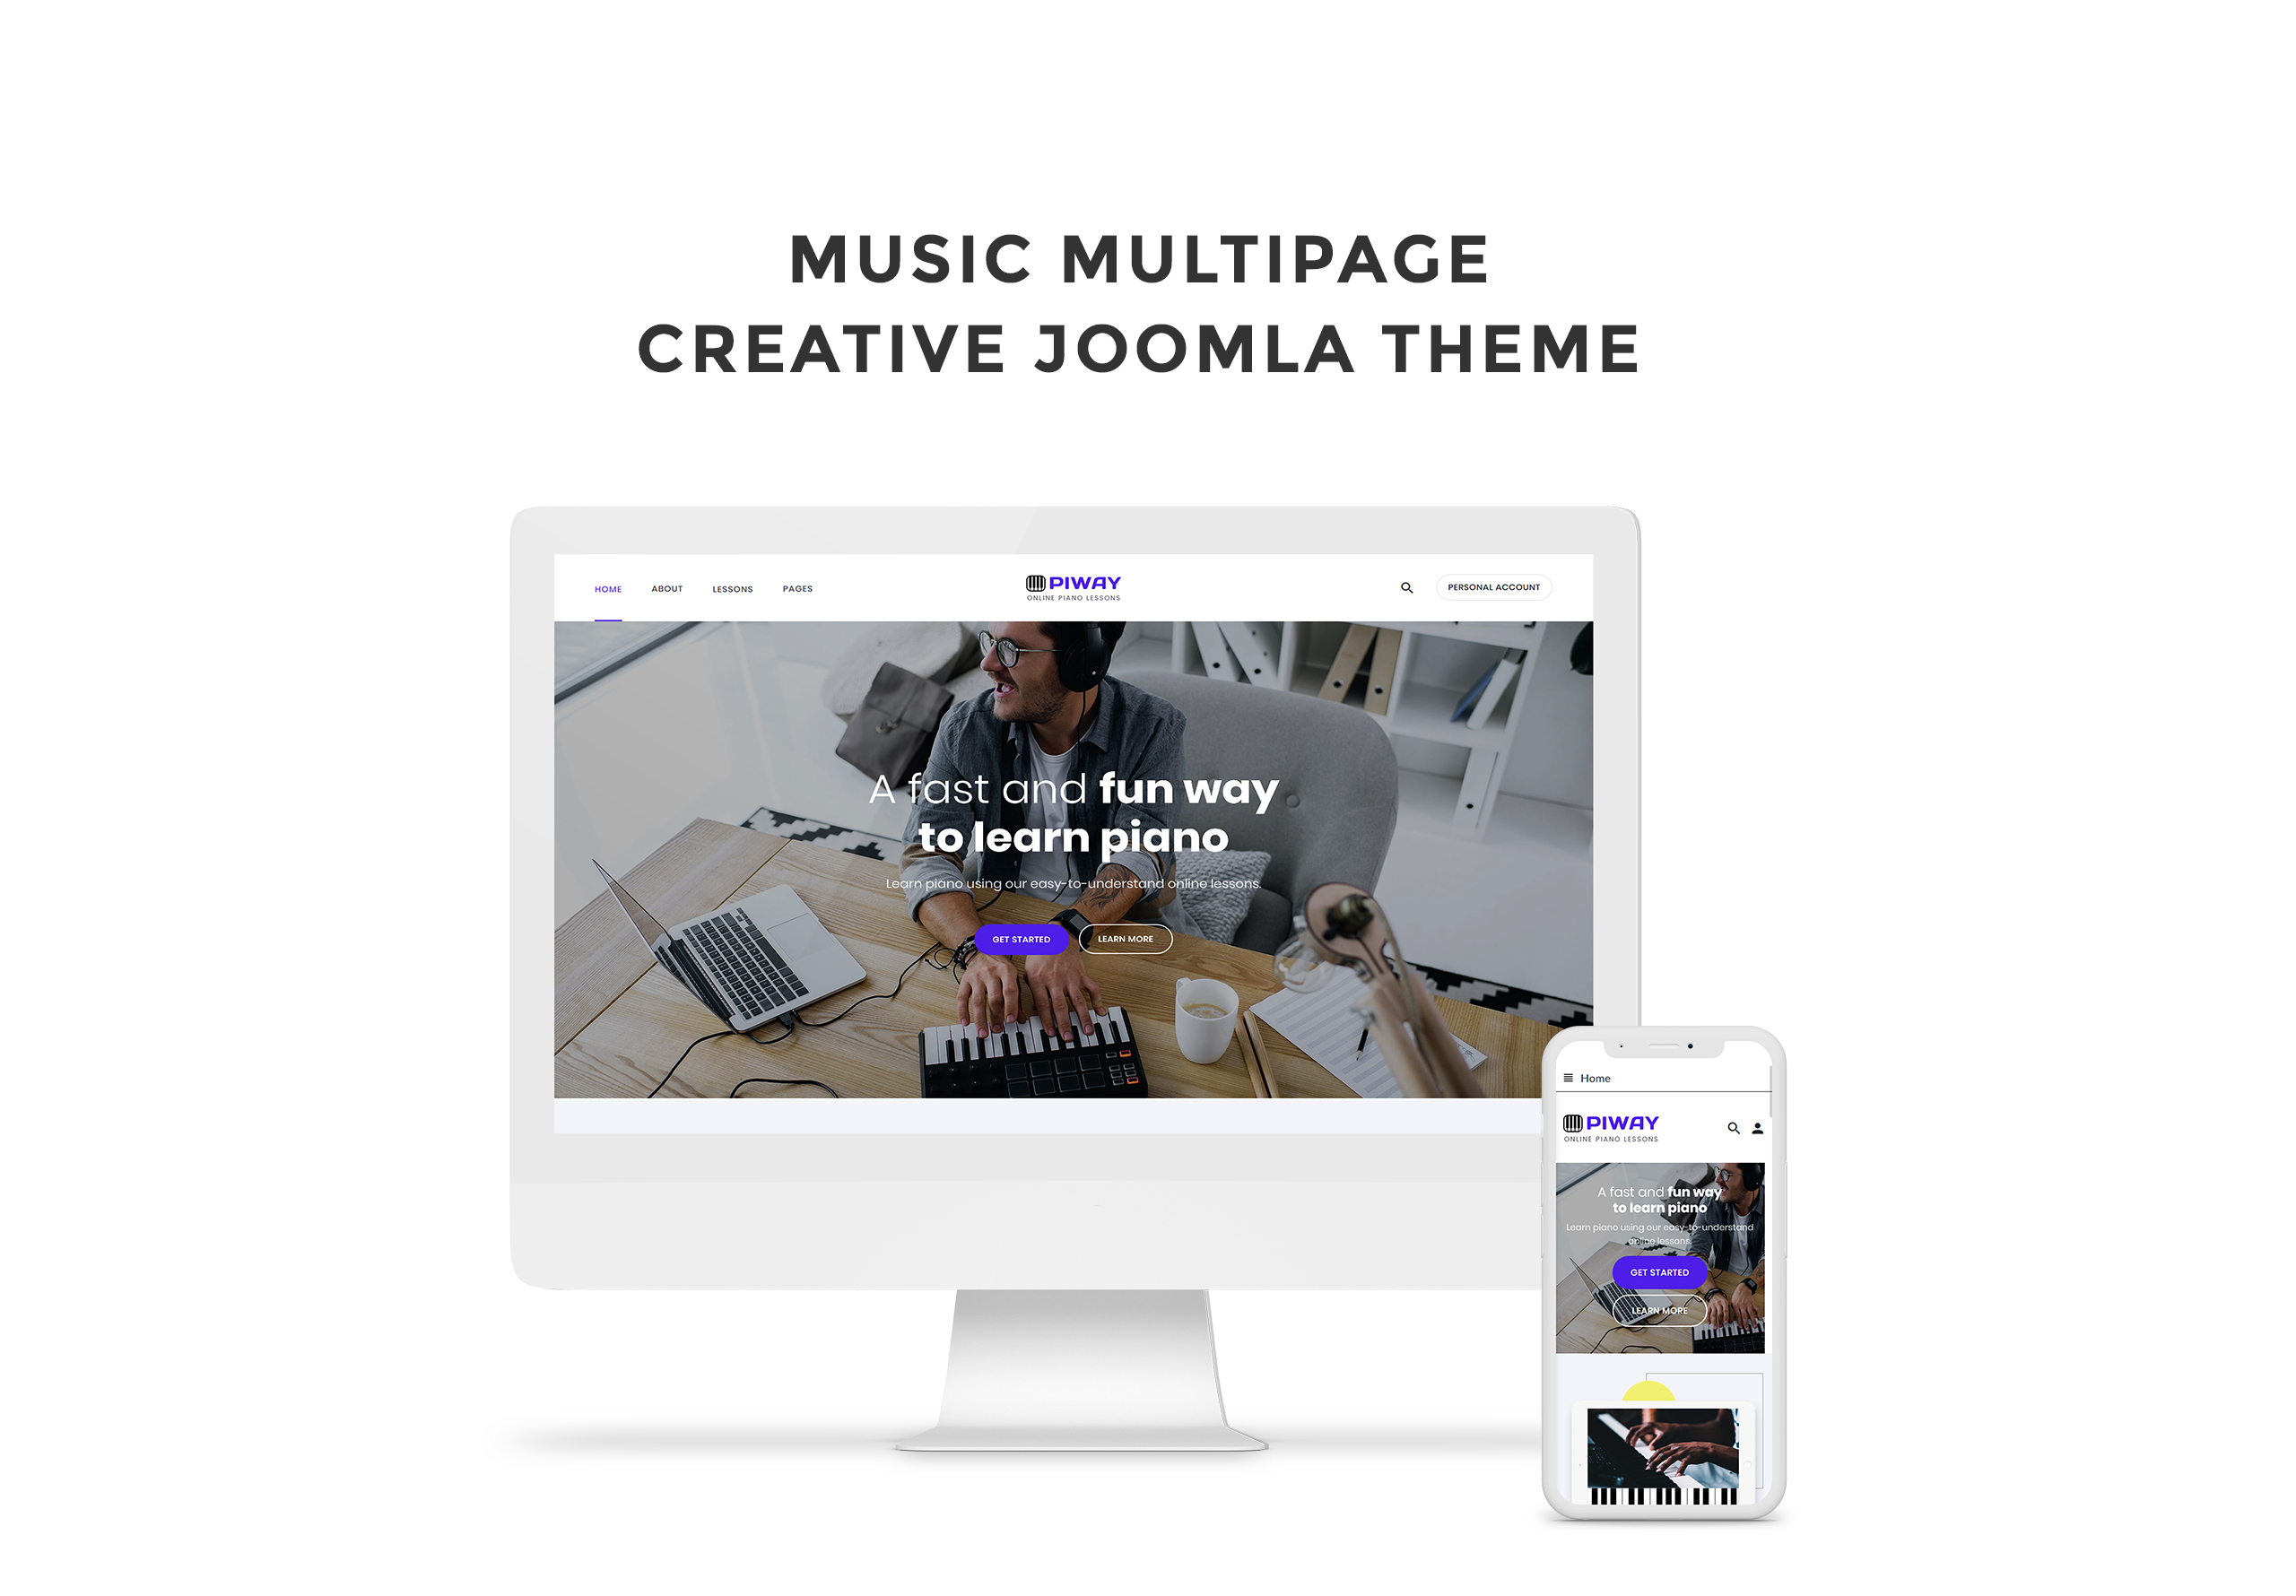 Piway - Music Multipage Creative Joomla Template